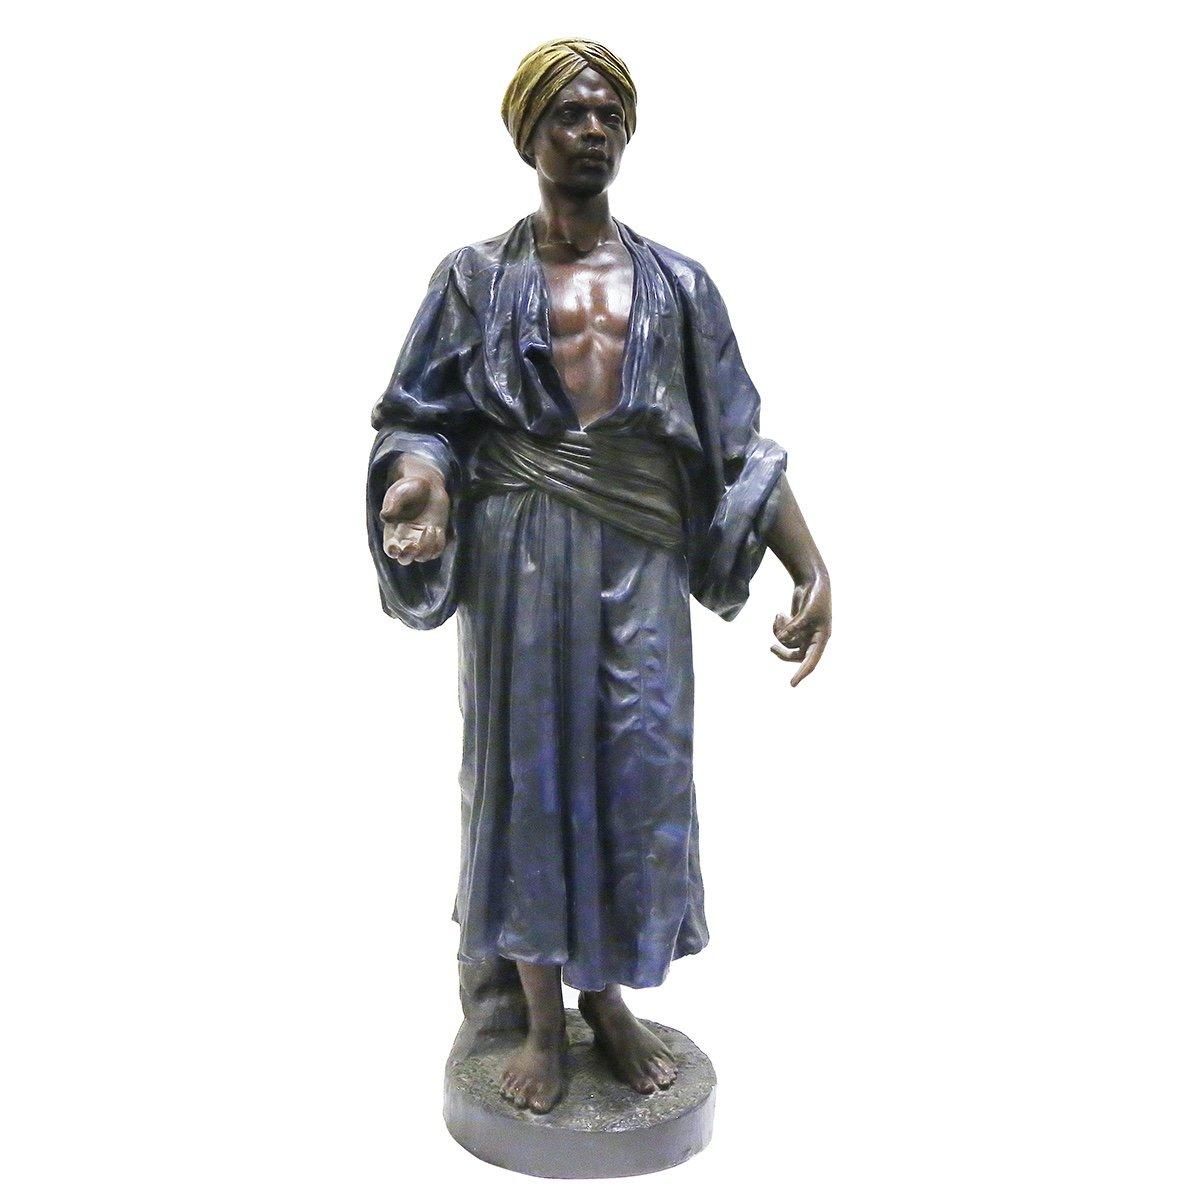 A Large 1930s Orientalist Statue-photo-2